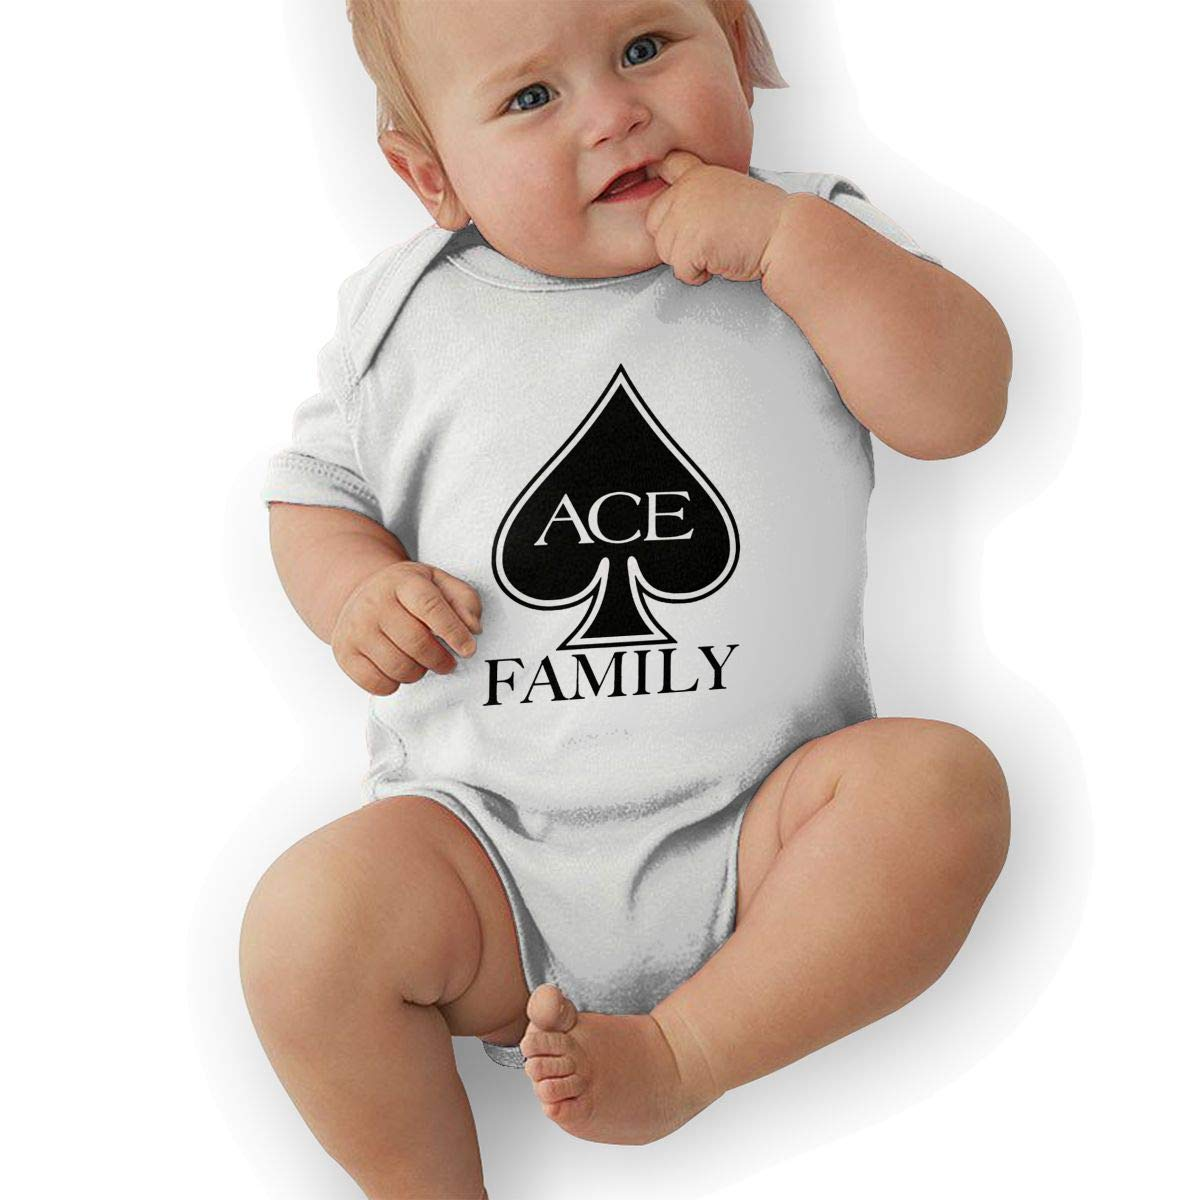 ACE Family Logo Short Sleeve Infant Jumpsuit Cute Onesie Summer Bodysuits